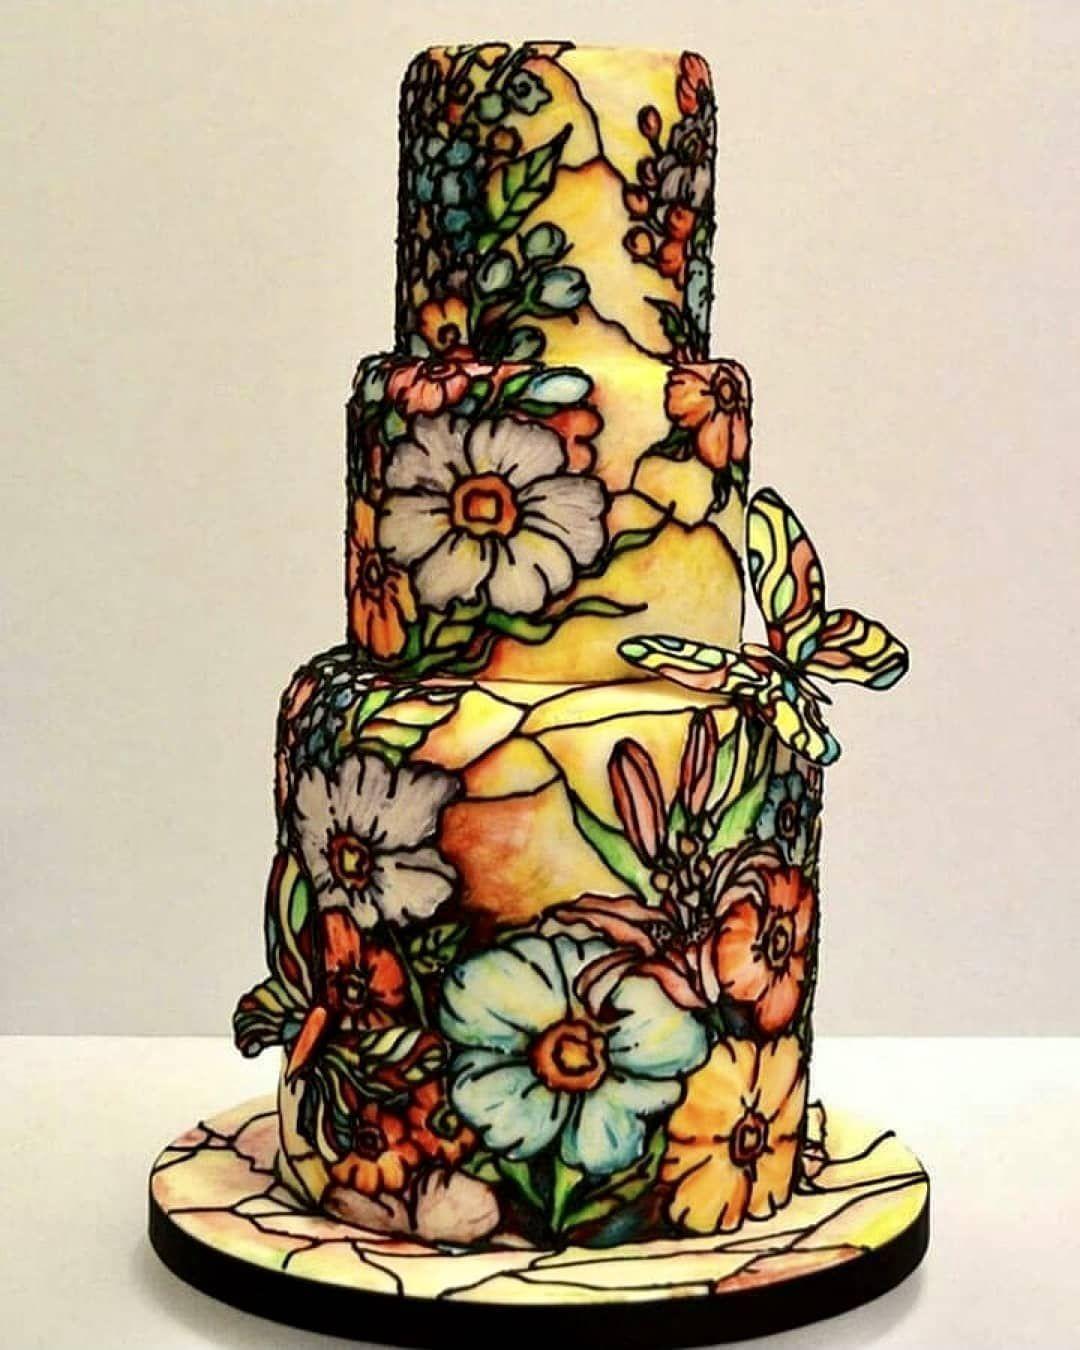 Cake art lookbook on instagram when is art this